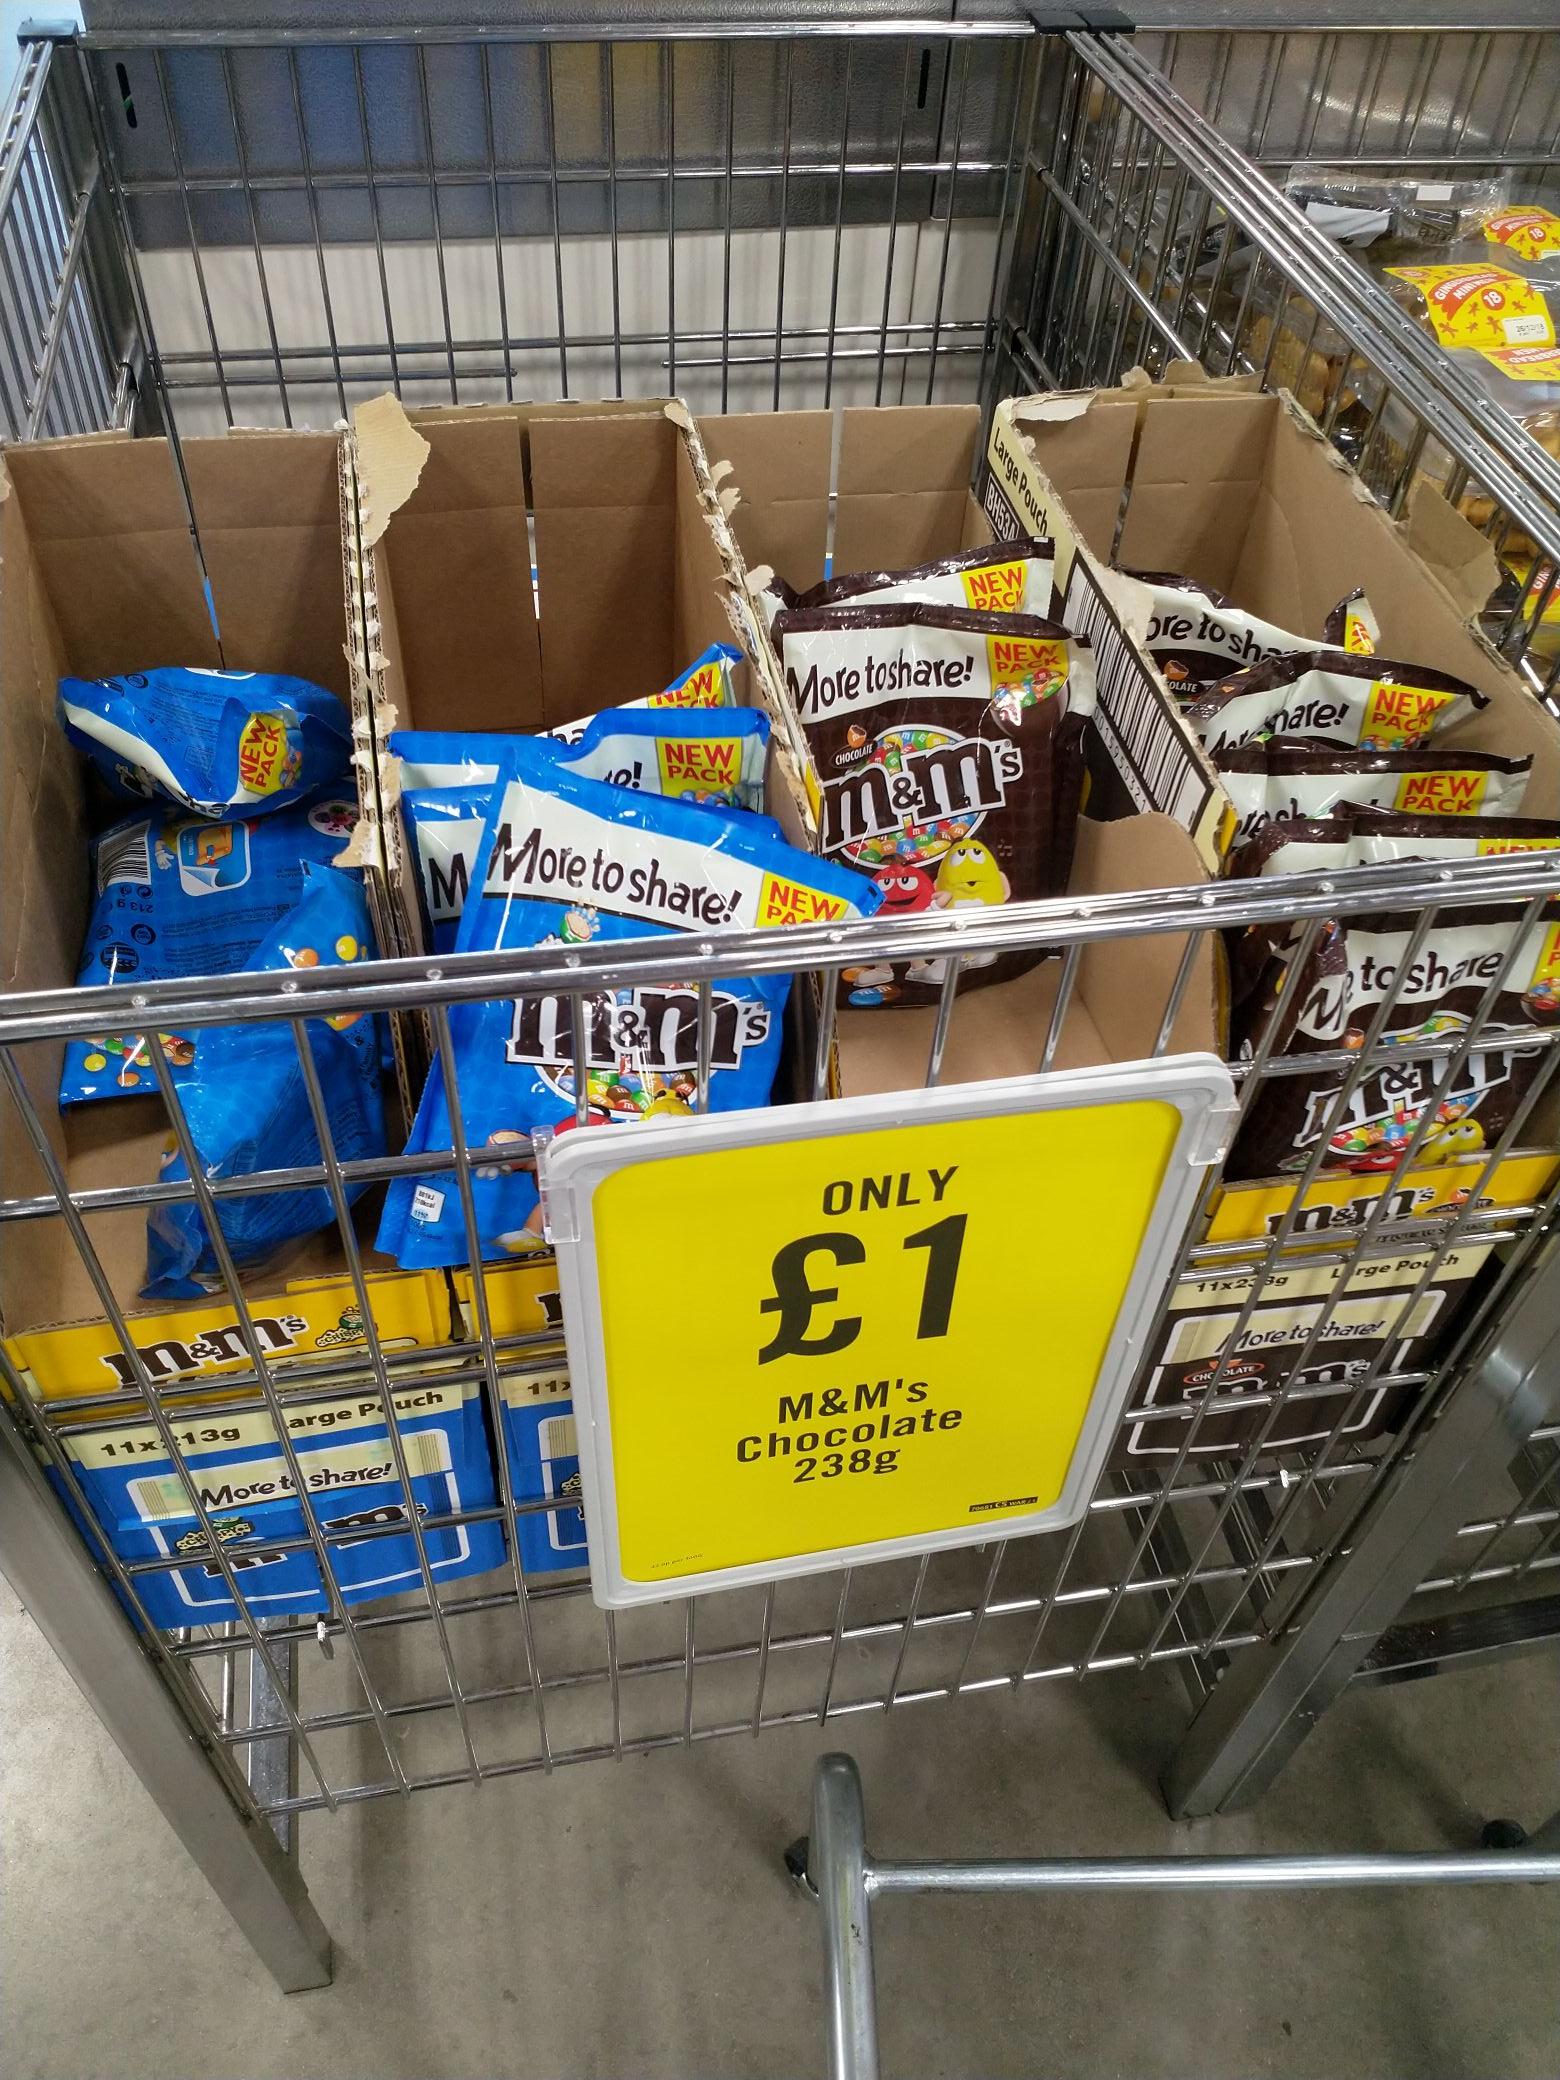 M&M's BIG BAGS £1 @ Iceland The Food Warehouse - Choc 238g / Crispy 213g